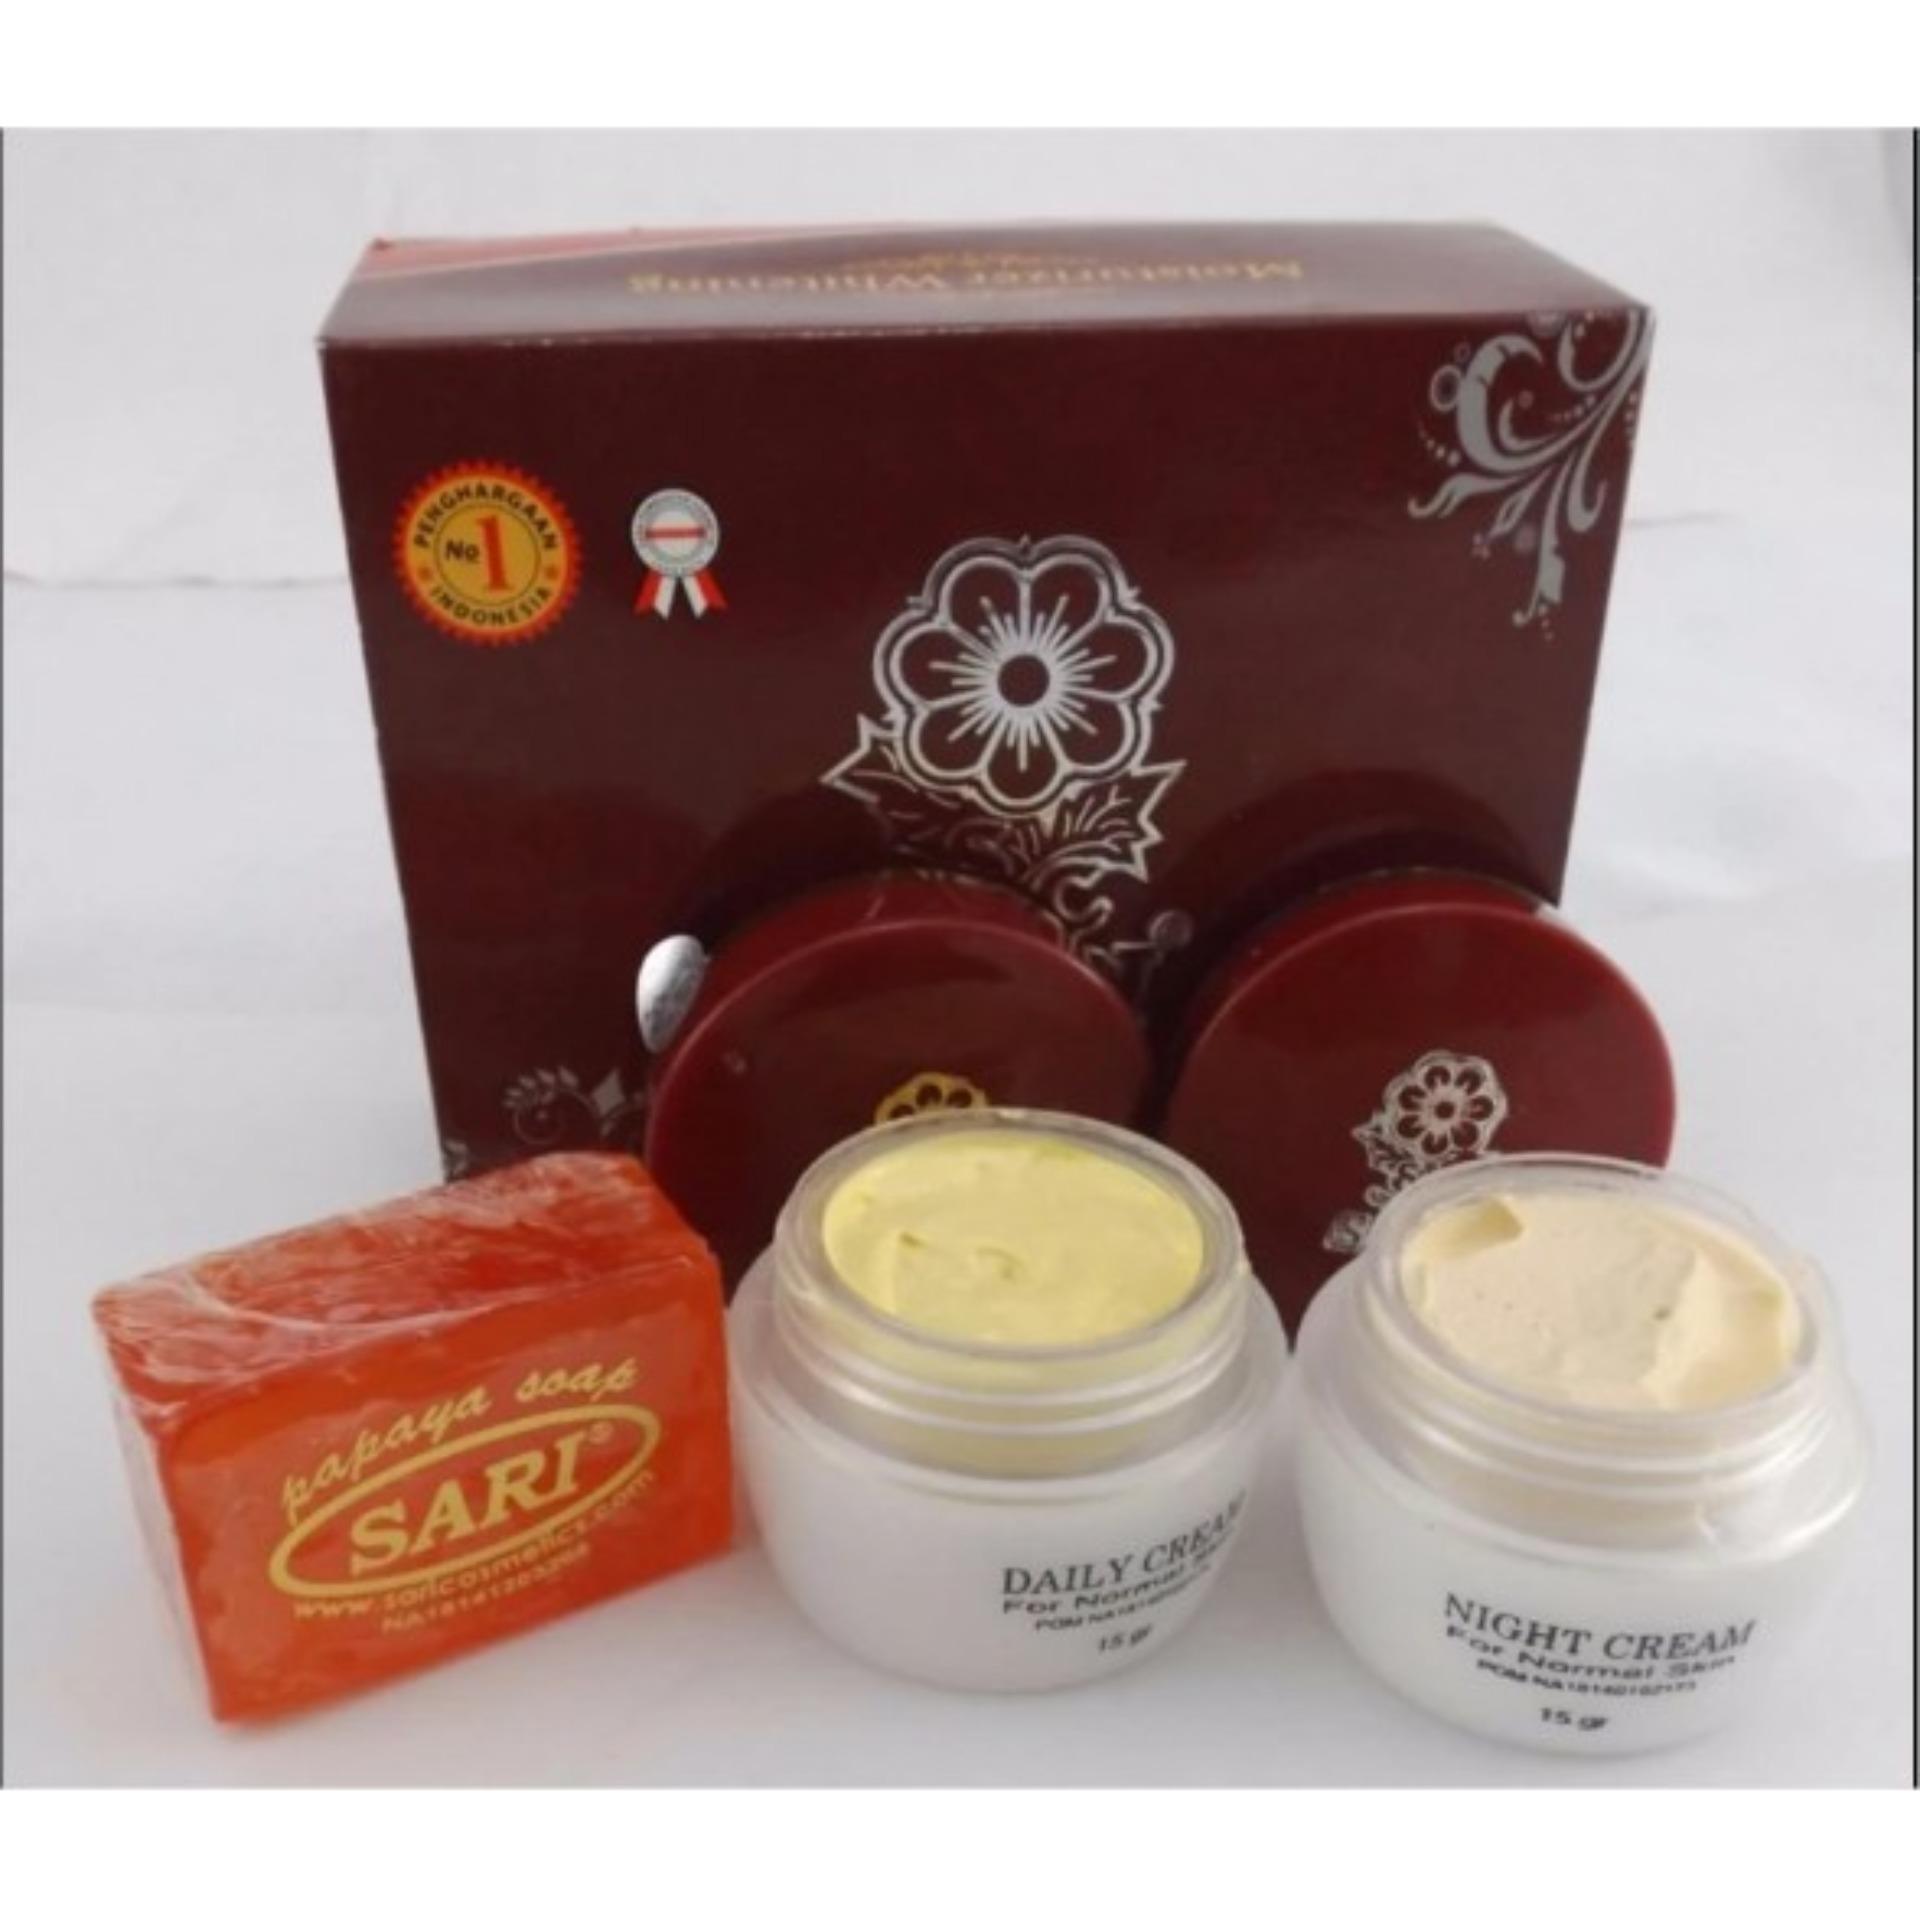 ... Cream Sari Moisturizer Whitening Untuk Kulit Normal Original ...